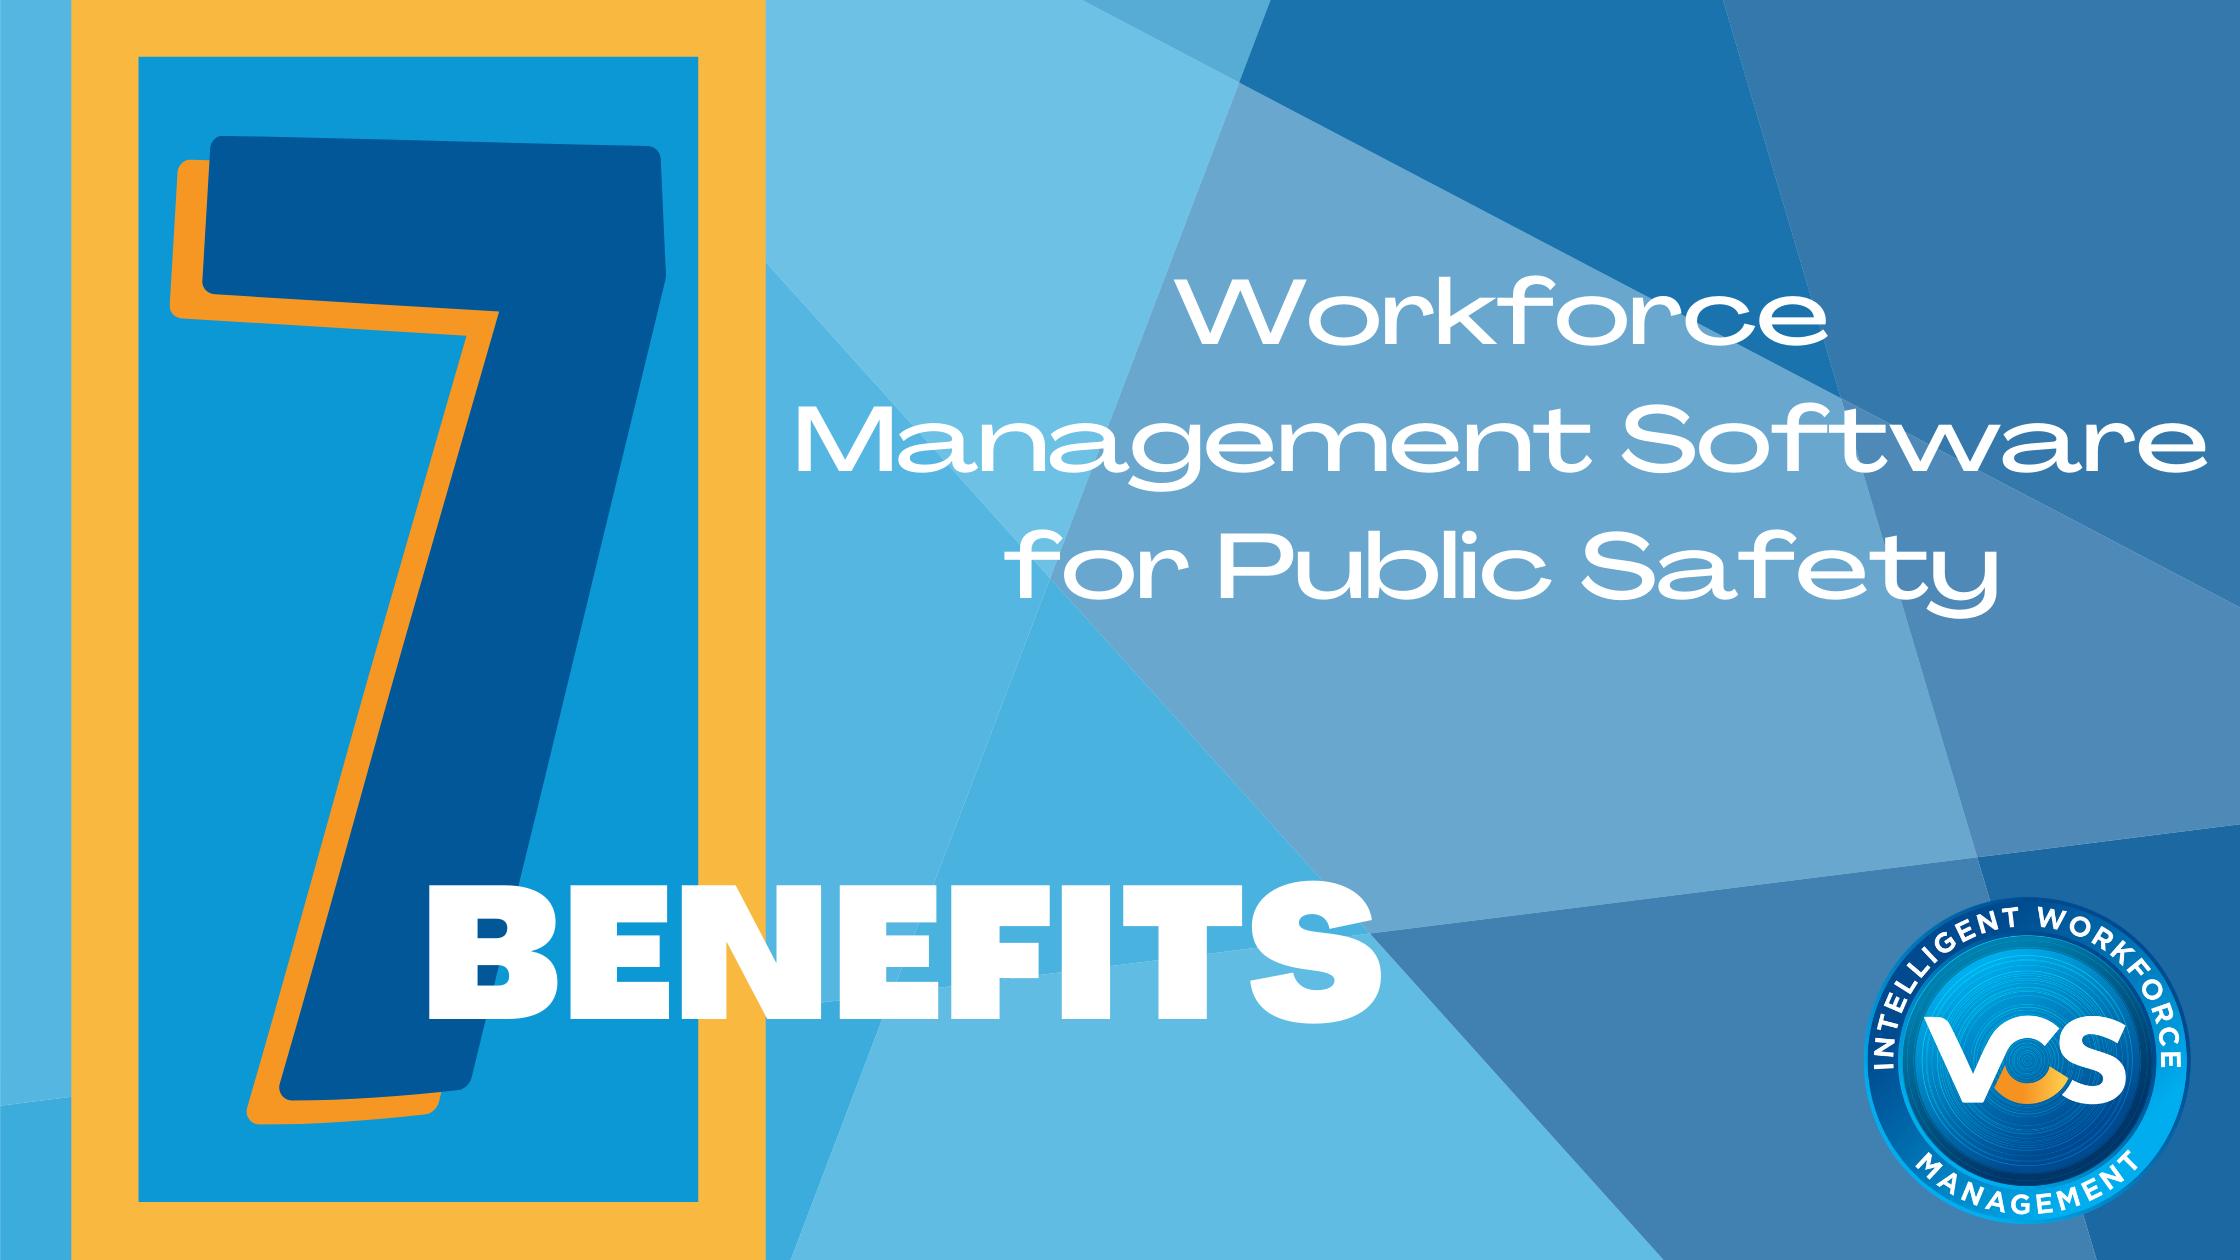 7 Benefits of Workforce Management Software for Public Safety